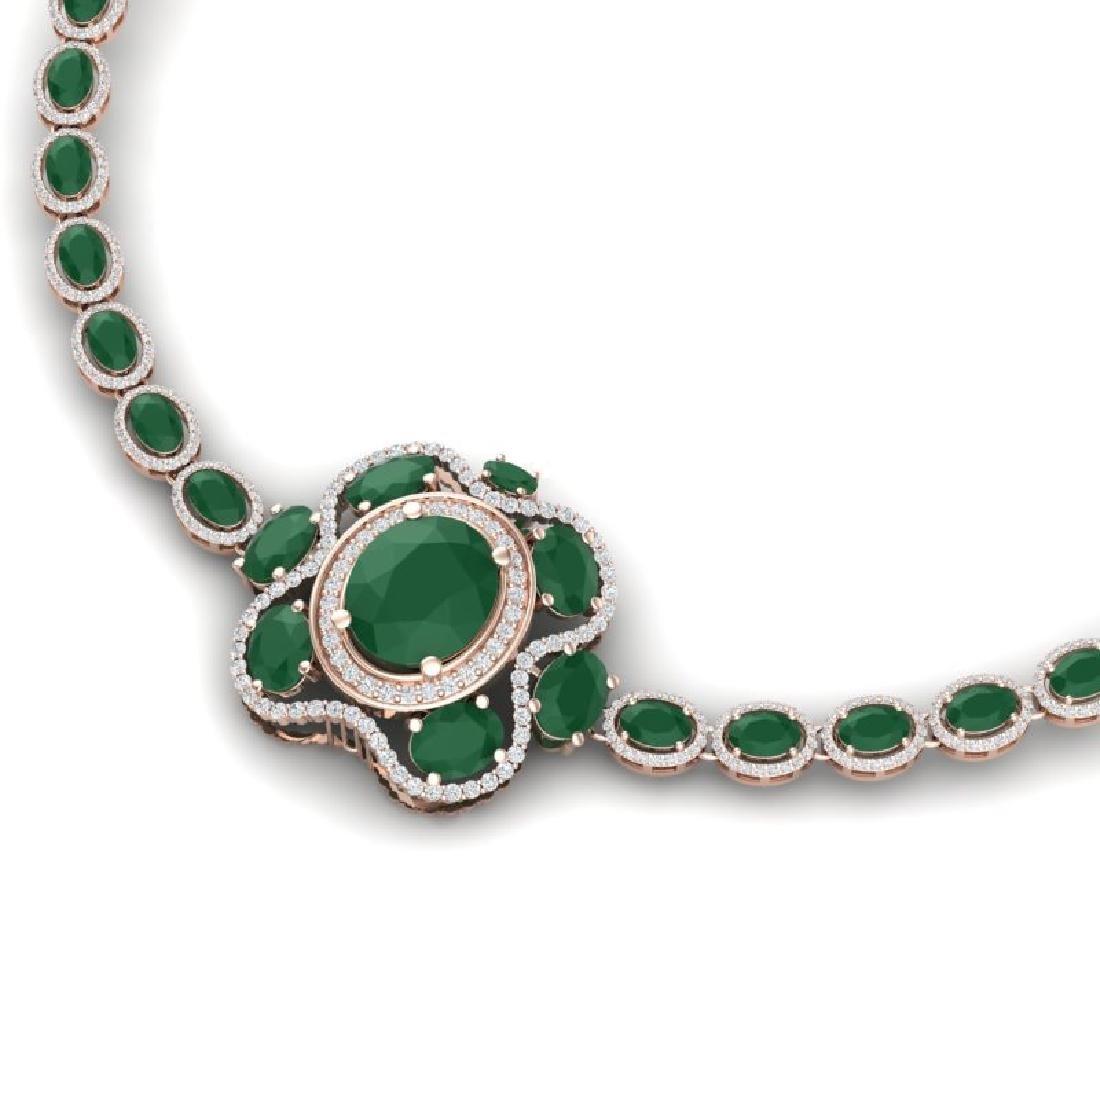 47.43 CTW Royalty Emerald & VS Diamond Necklace 18K